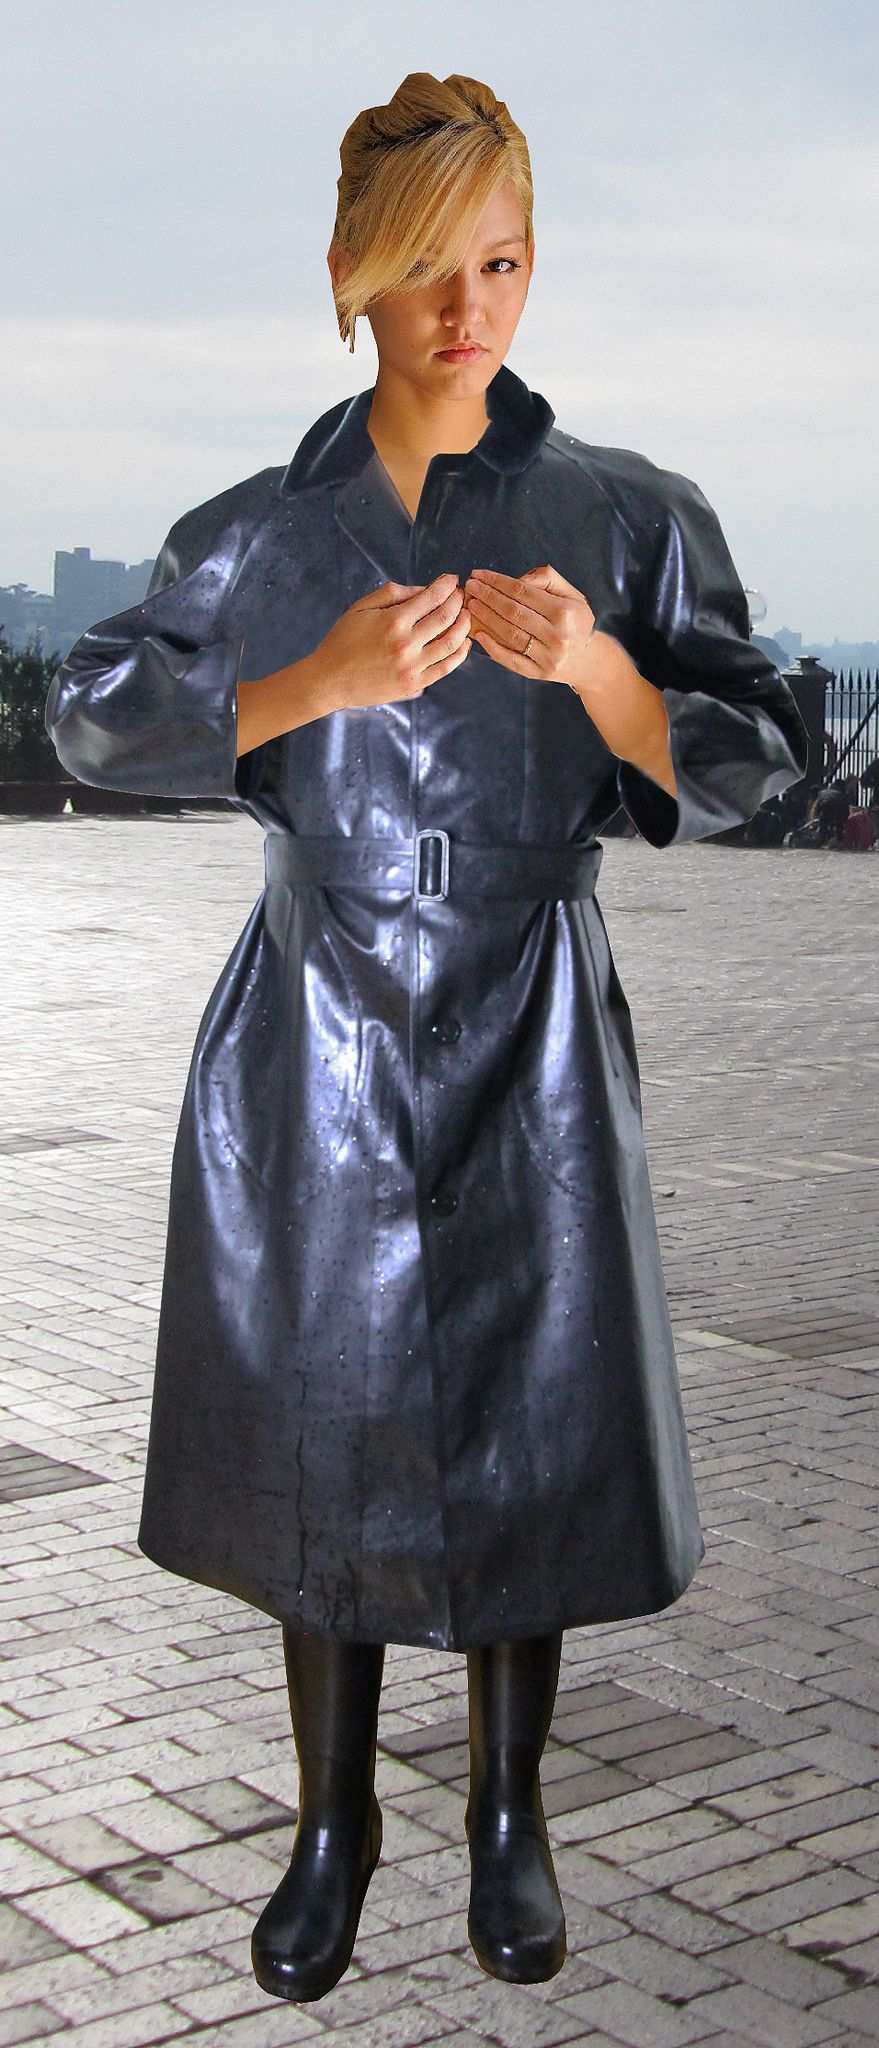 https://flic.kr/p/BVCetg   rainyday   Black Ascot SBR raincoat from Weather Vain & Hunter Rubber Gum Boots